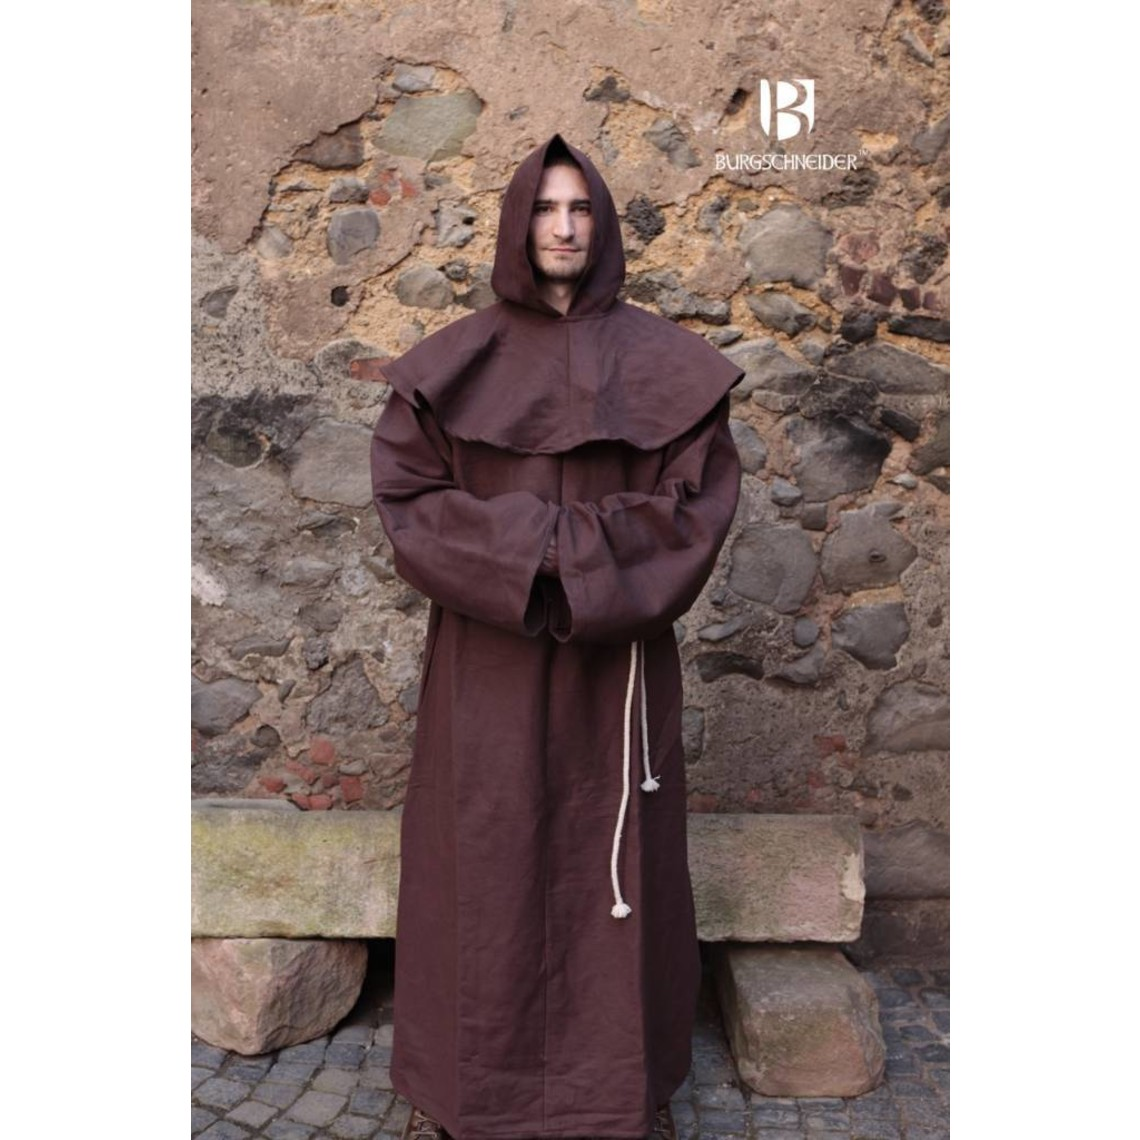 Burgschneider Habit franciscain